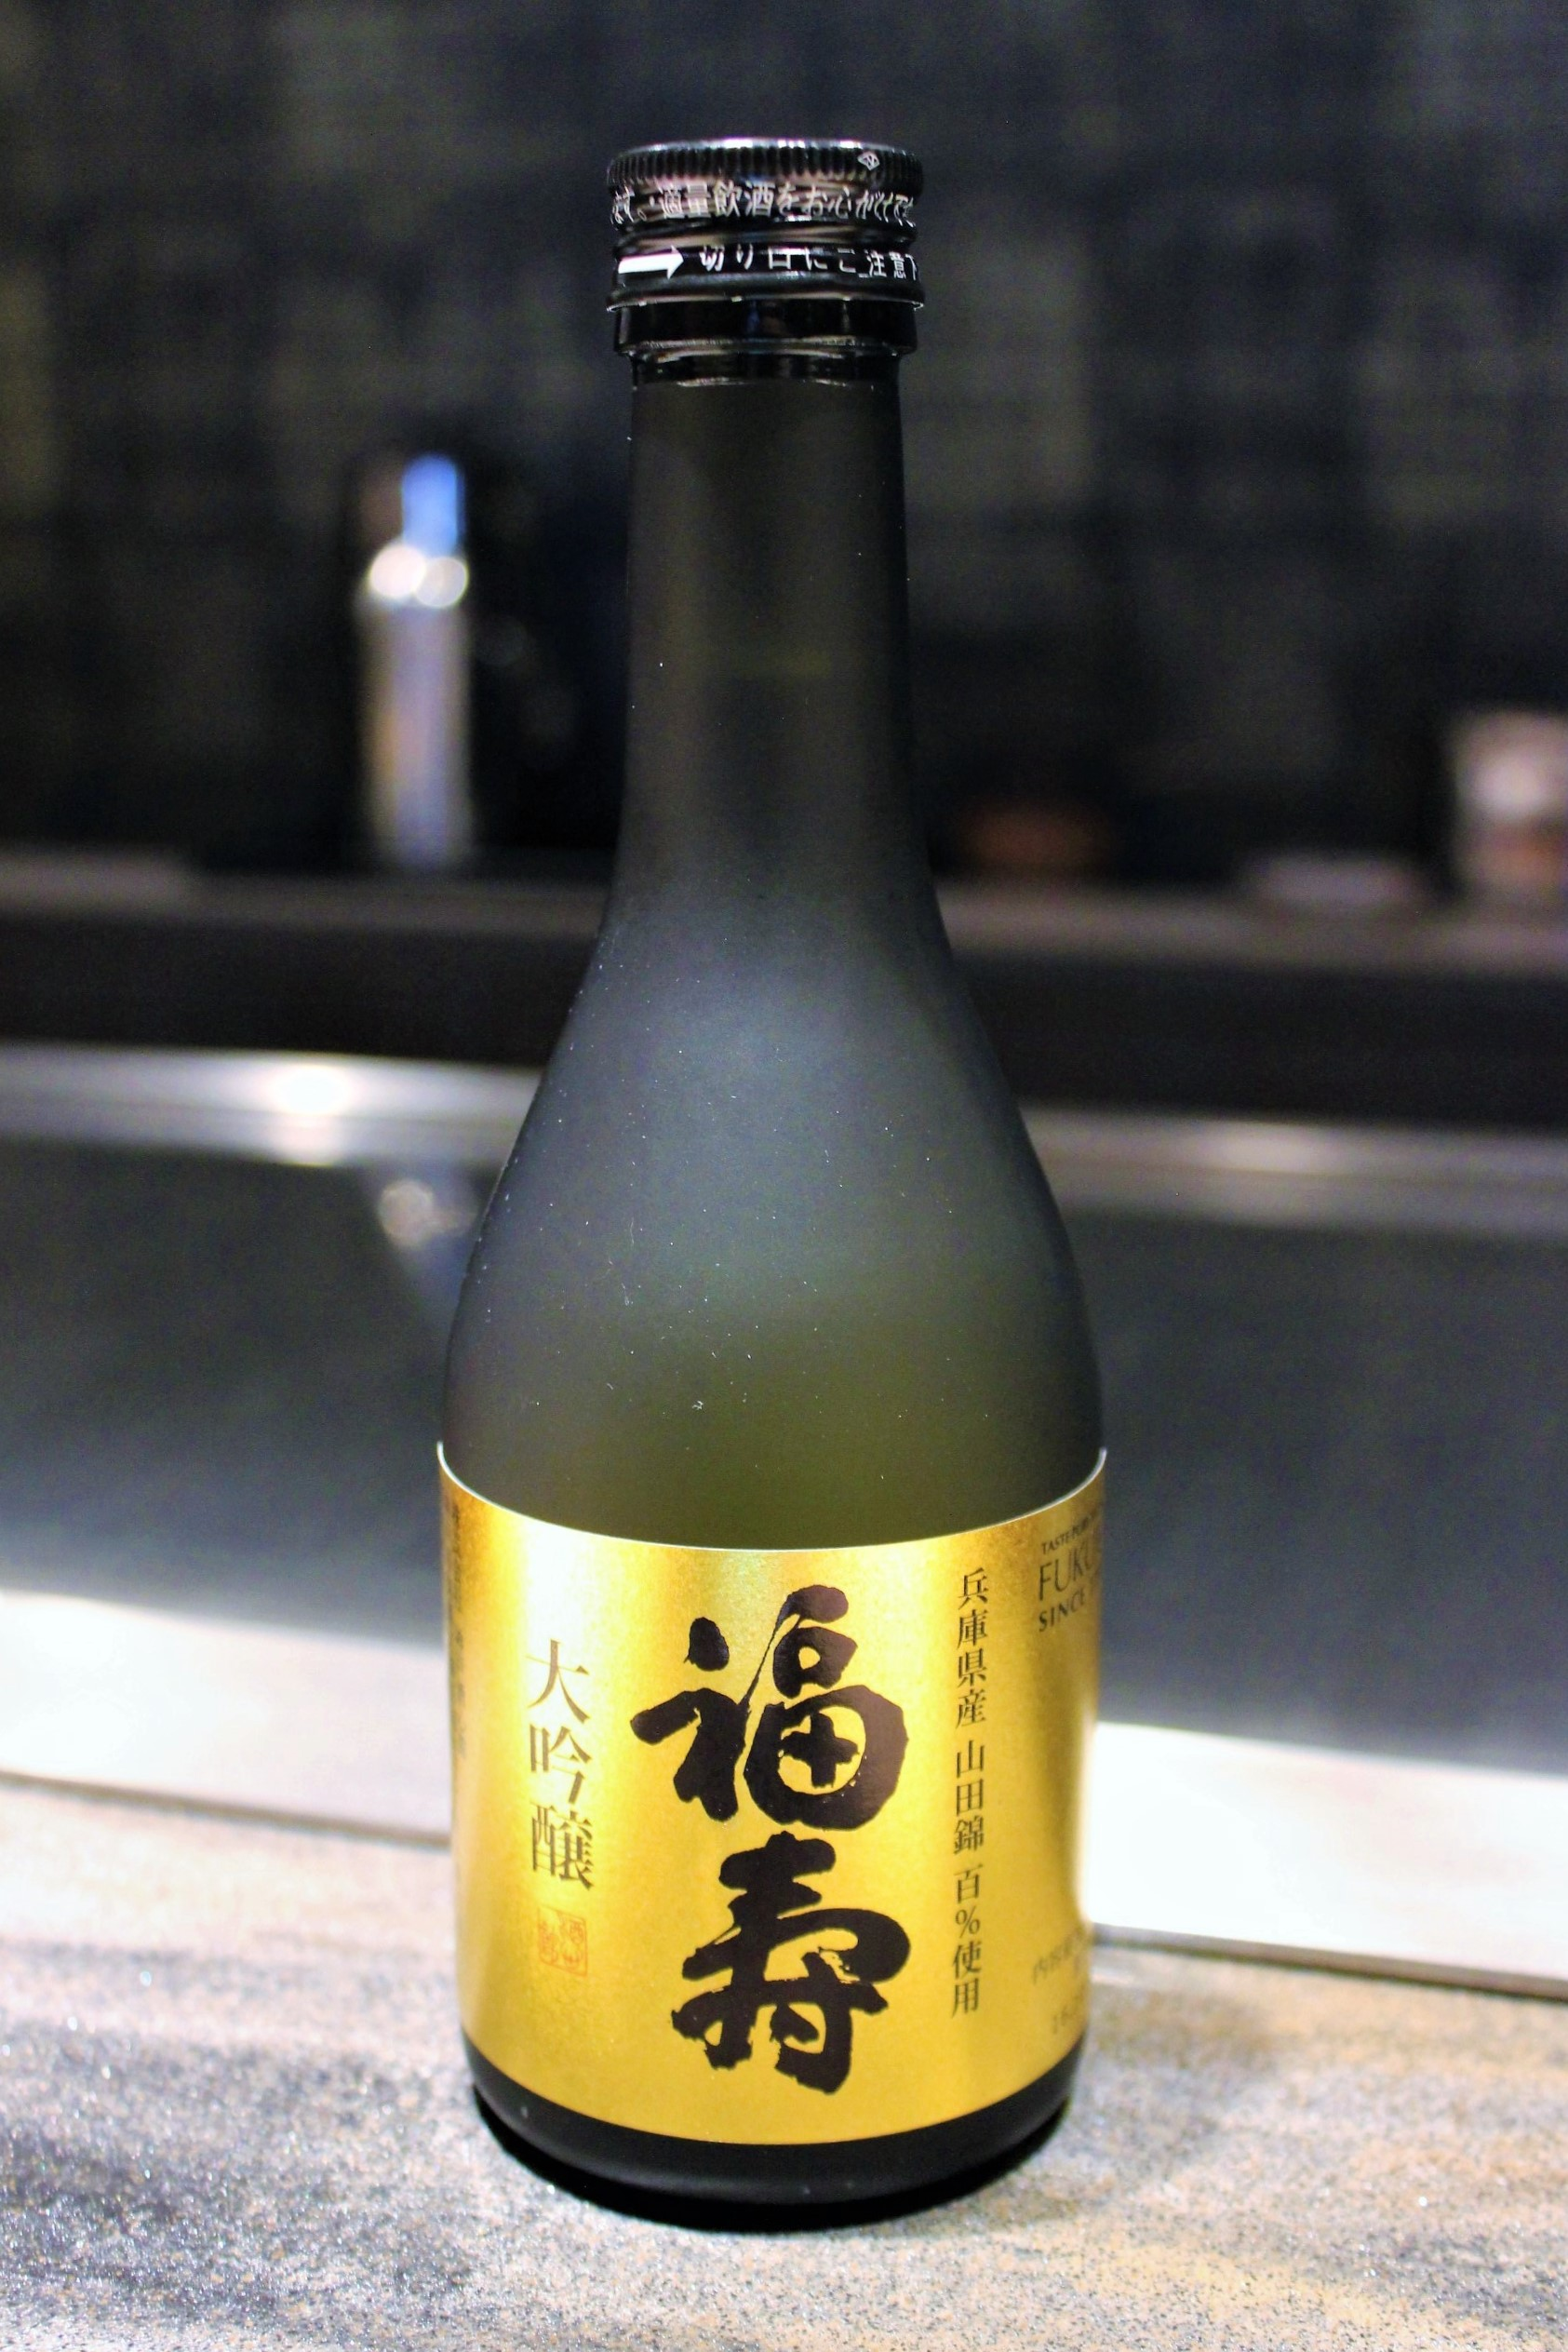 Fukuju Daiginjo Sake